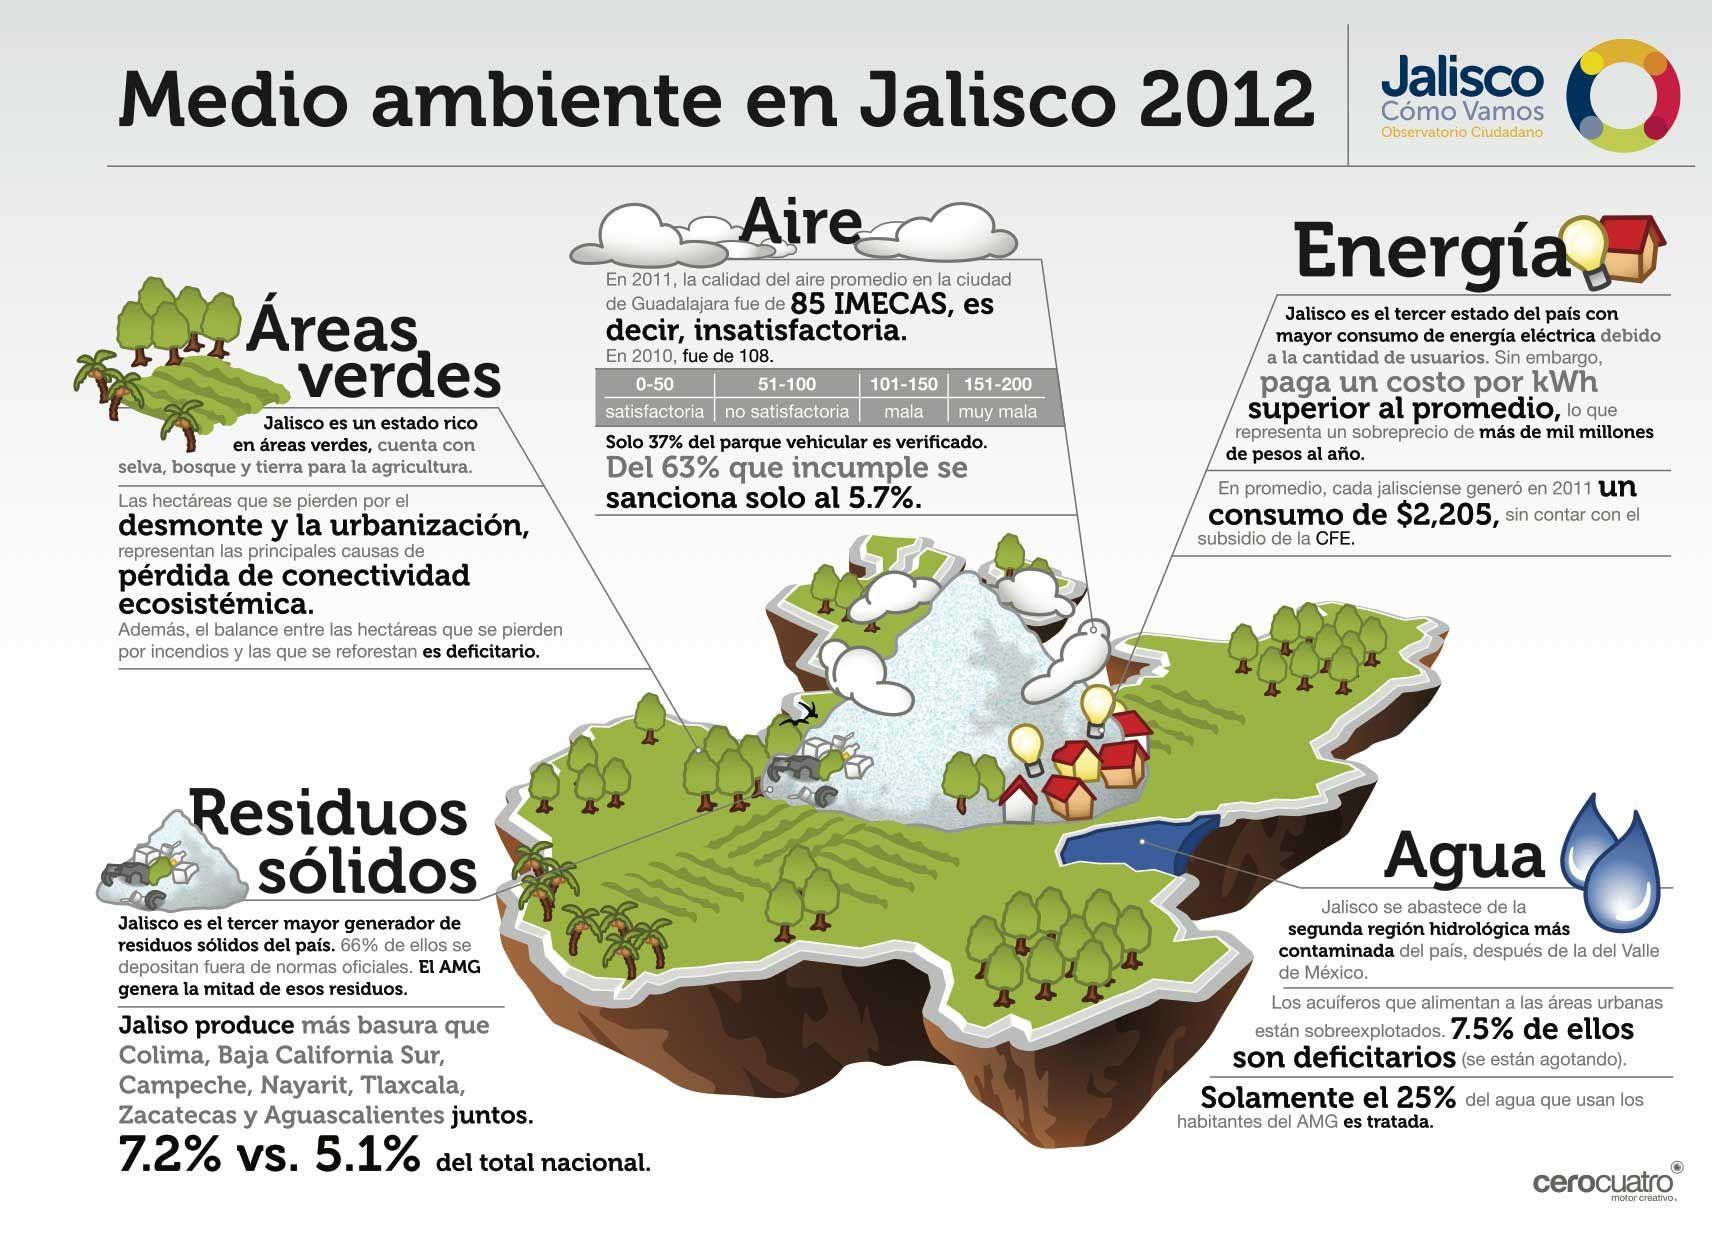 10 Infografia Medio Ambiente Outline Jpg 1 712 1 240 Pixeles Medio Ambiente Infografia Medio Ambiente Ambiente